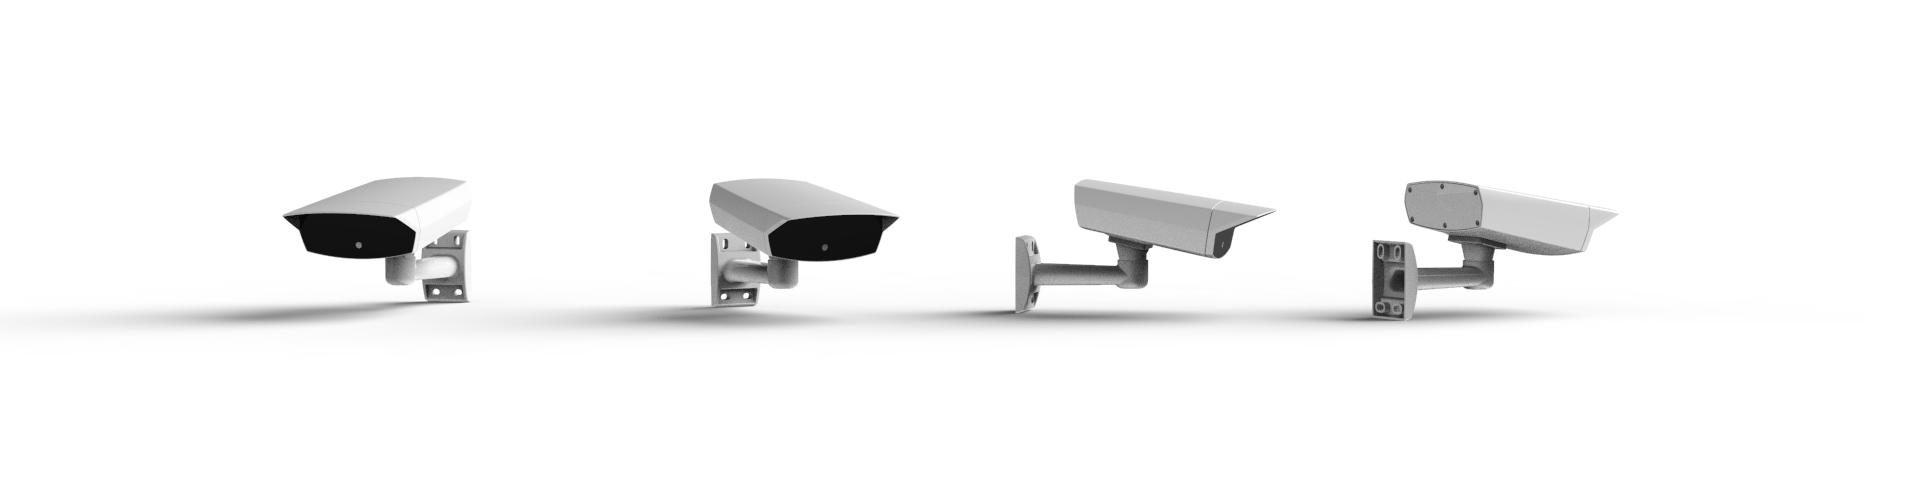 Gatekeeper embedded ANPR camera